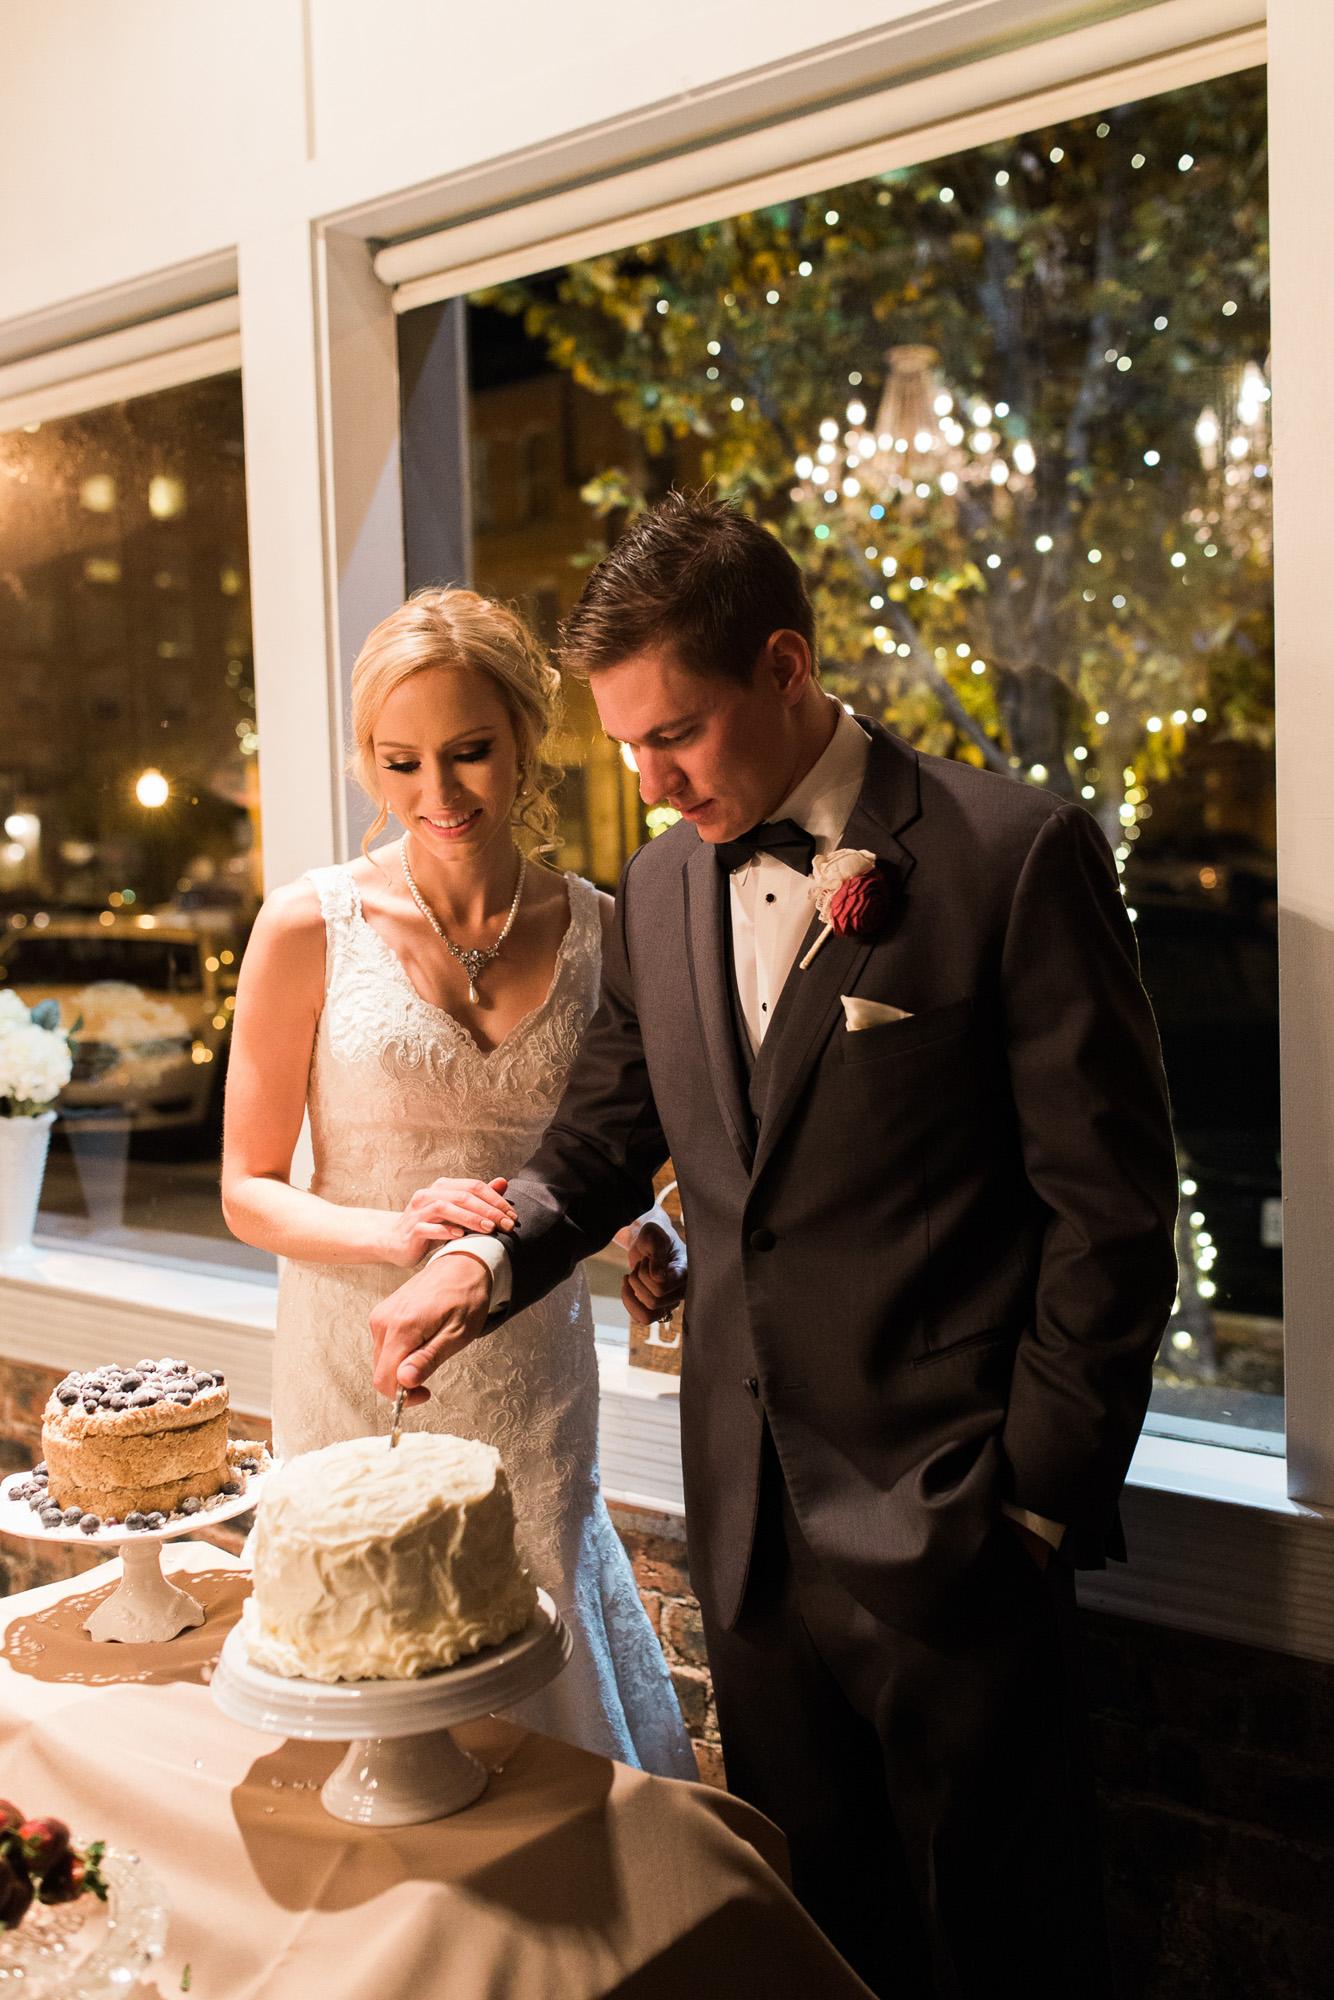 66137-downtown-bryan-weddingdowntown-bryan-wedding.jpg